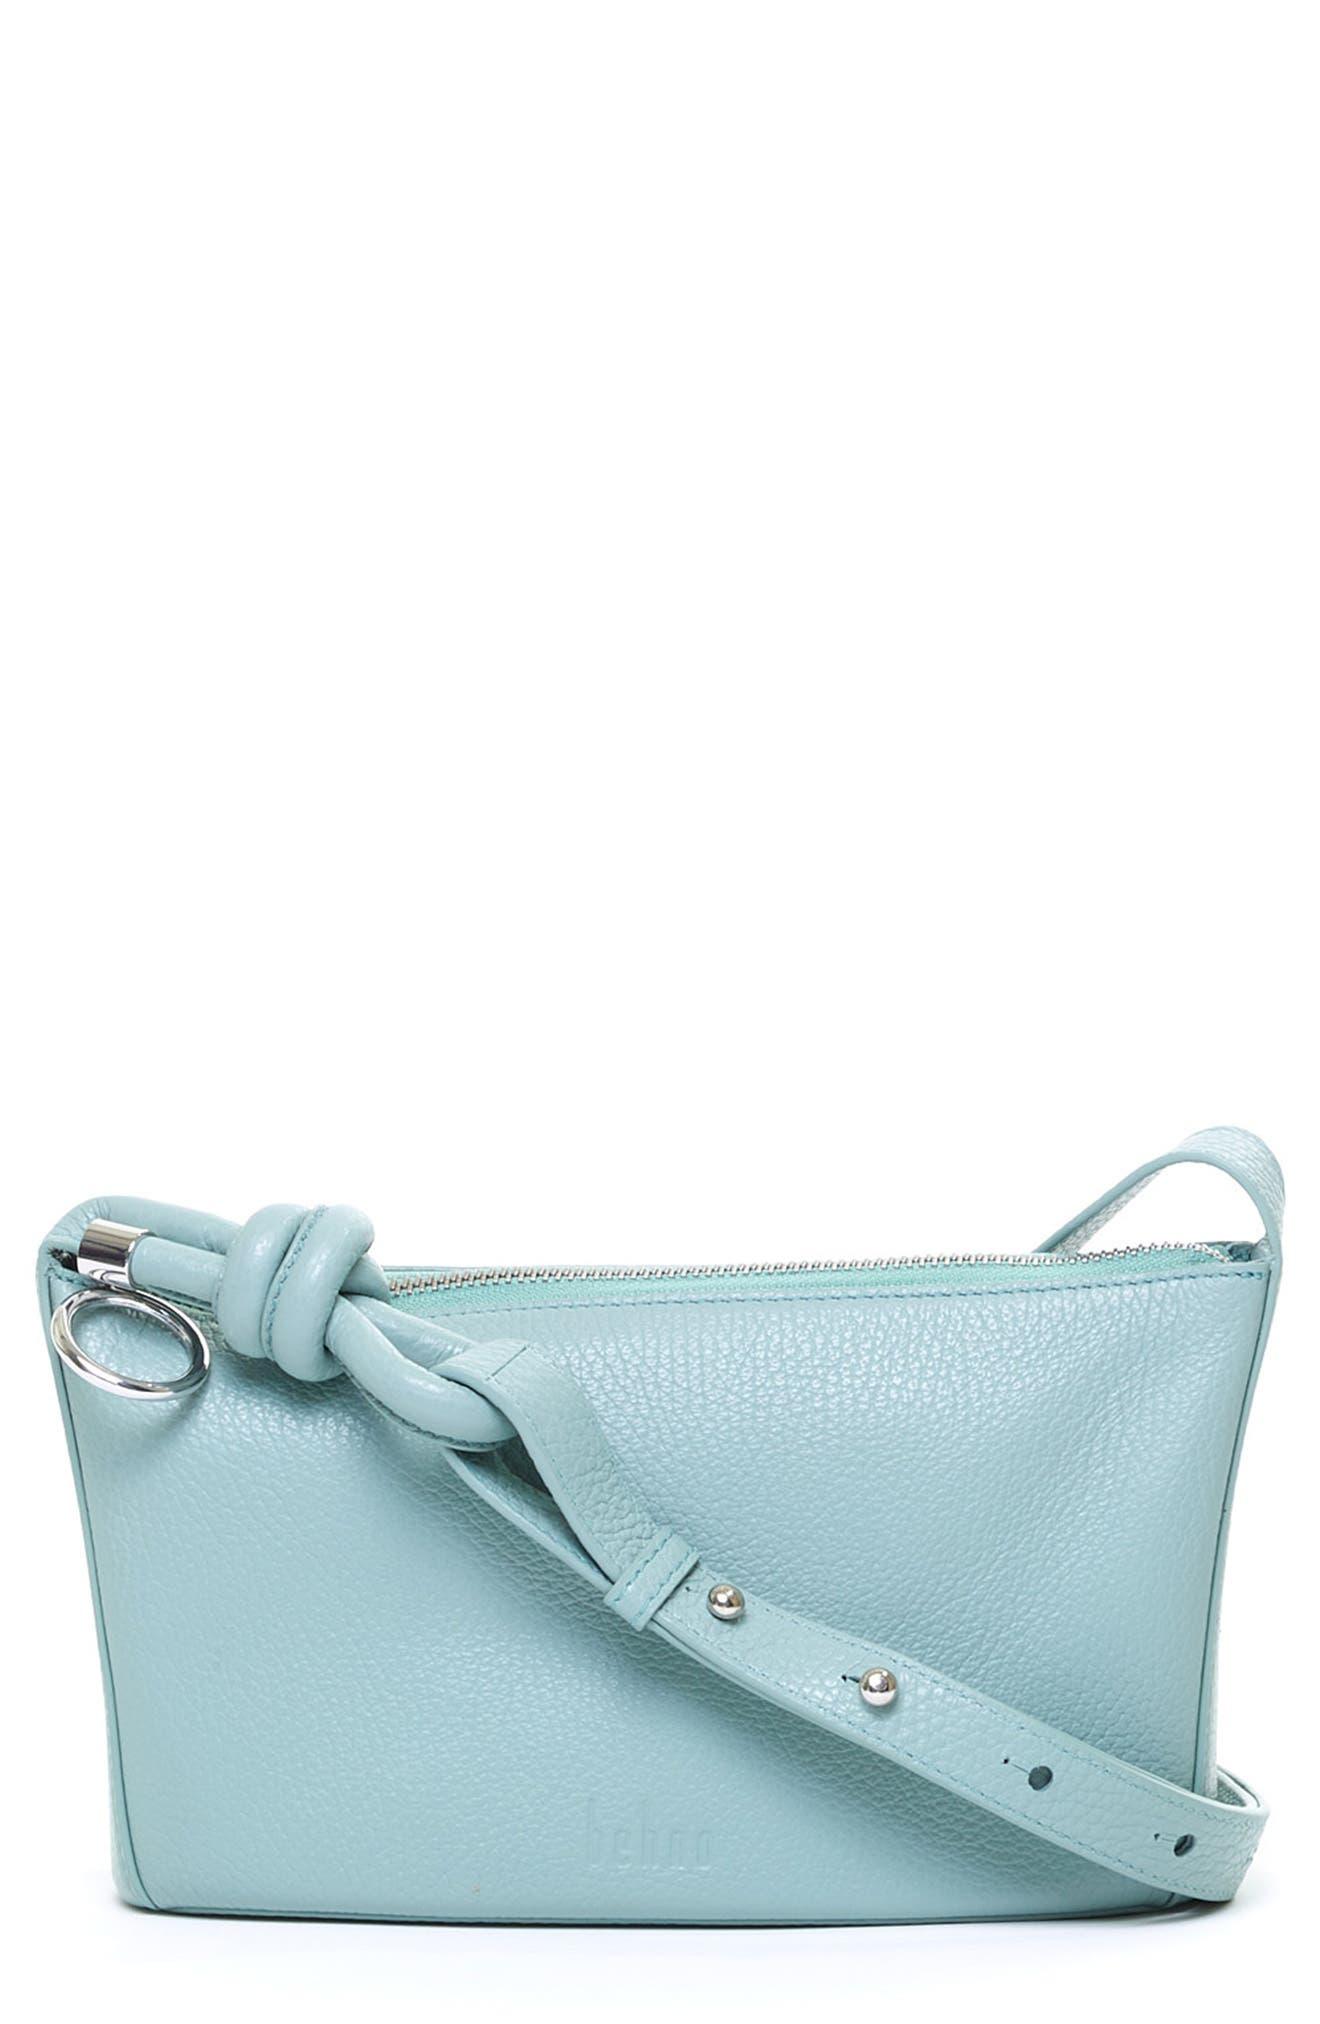 Janae Leather Crossbody Bag